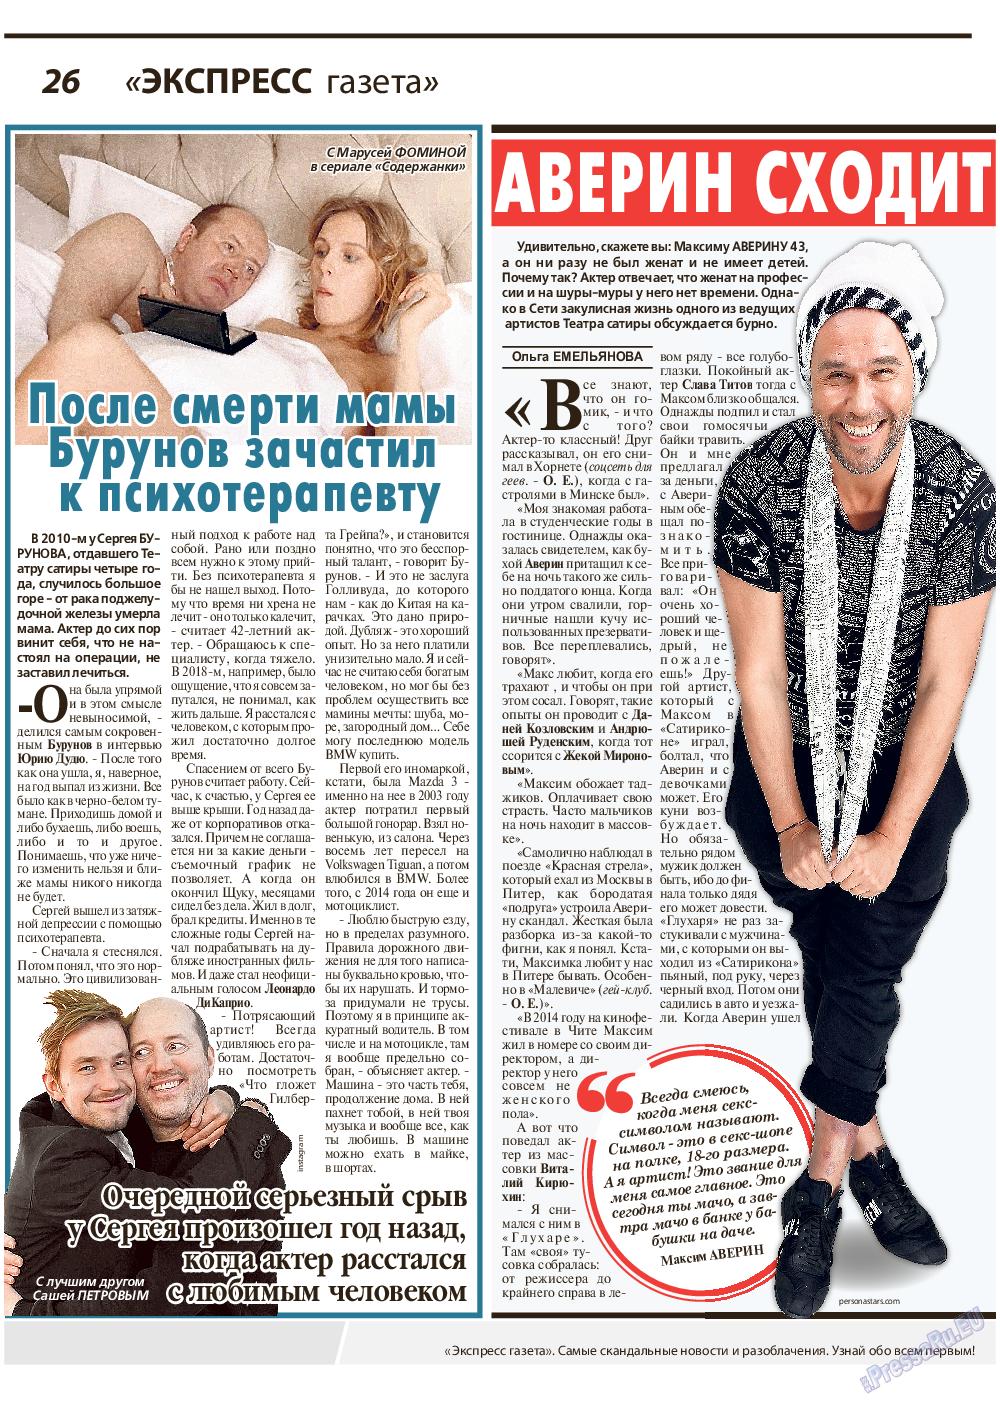 Экспресс газета (газета). 2019 год, номер 9, стр. 26